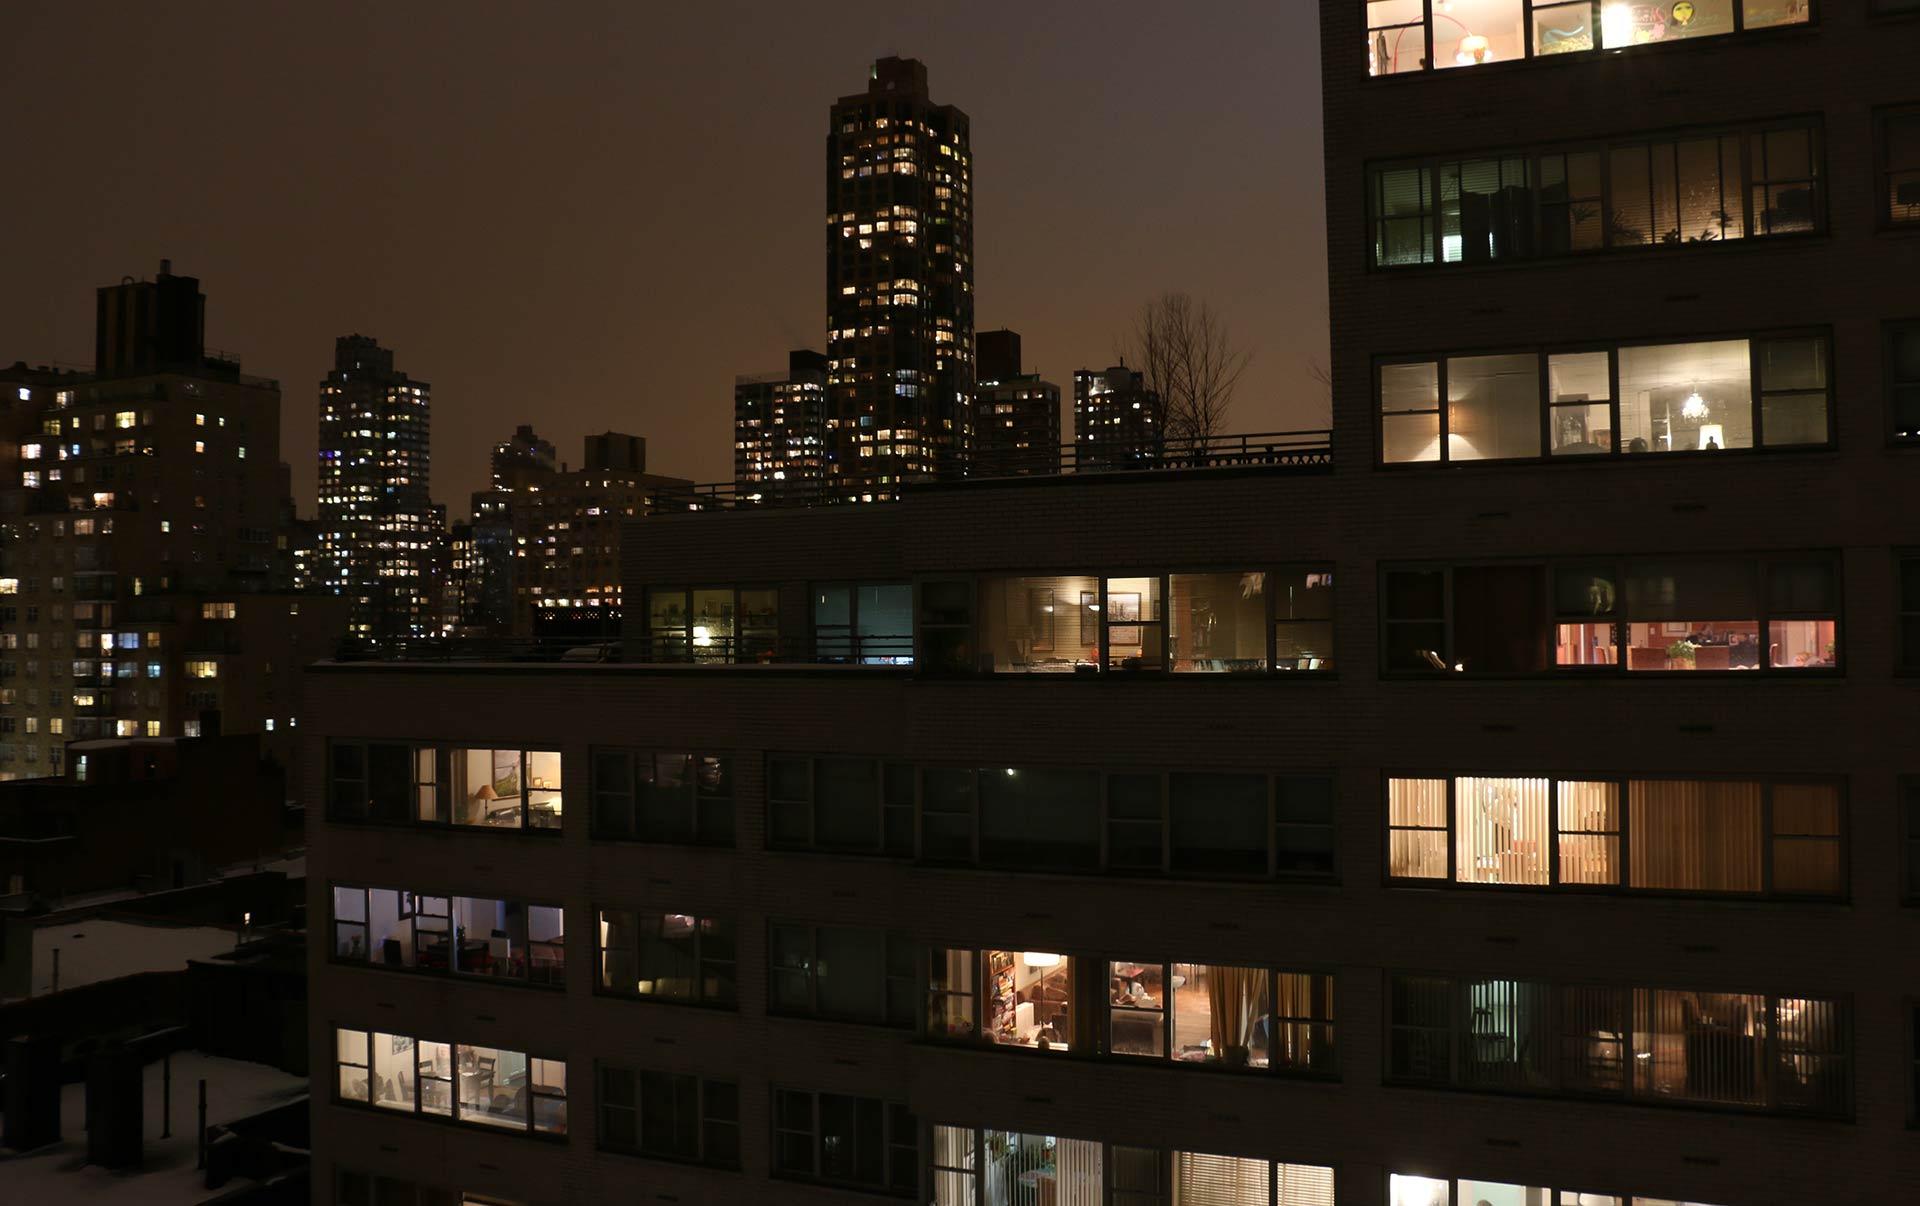 Urban_NightScene_sm